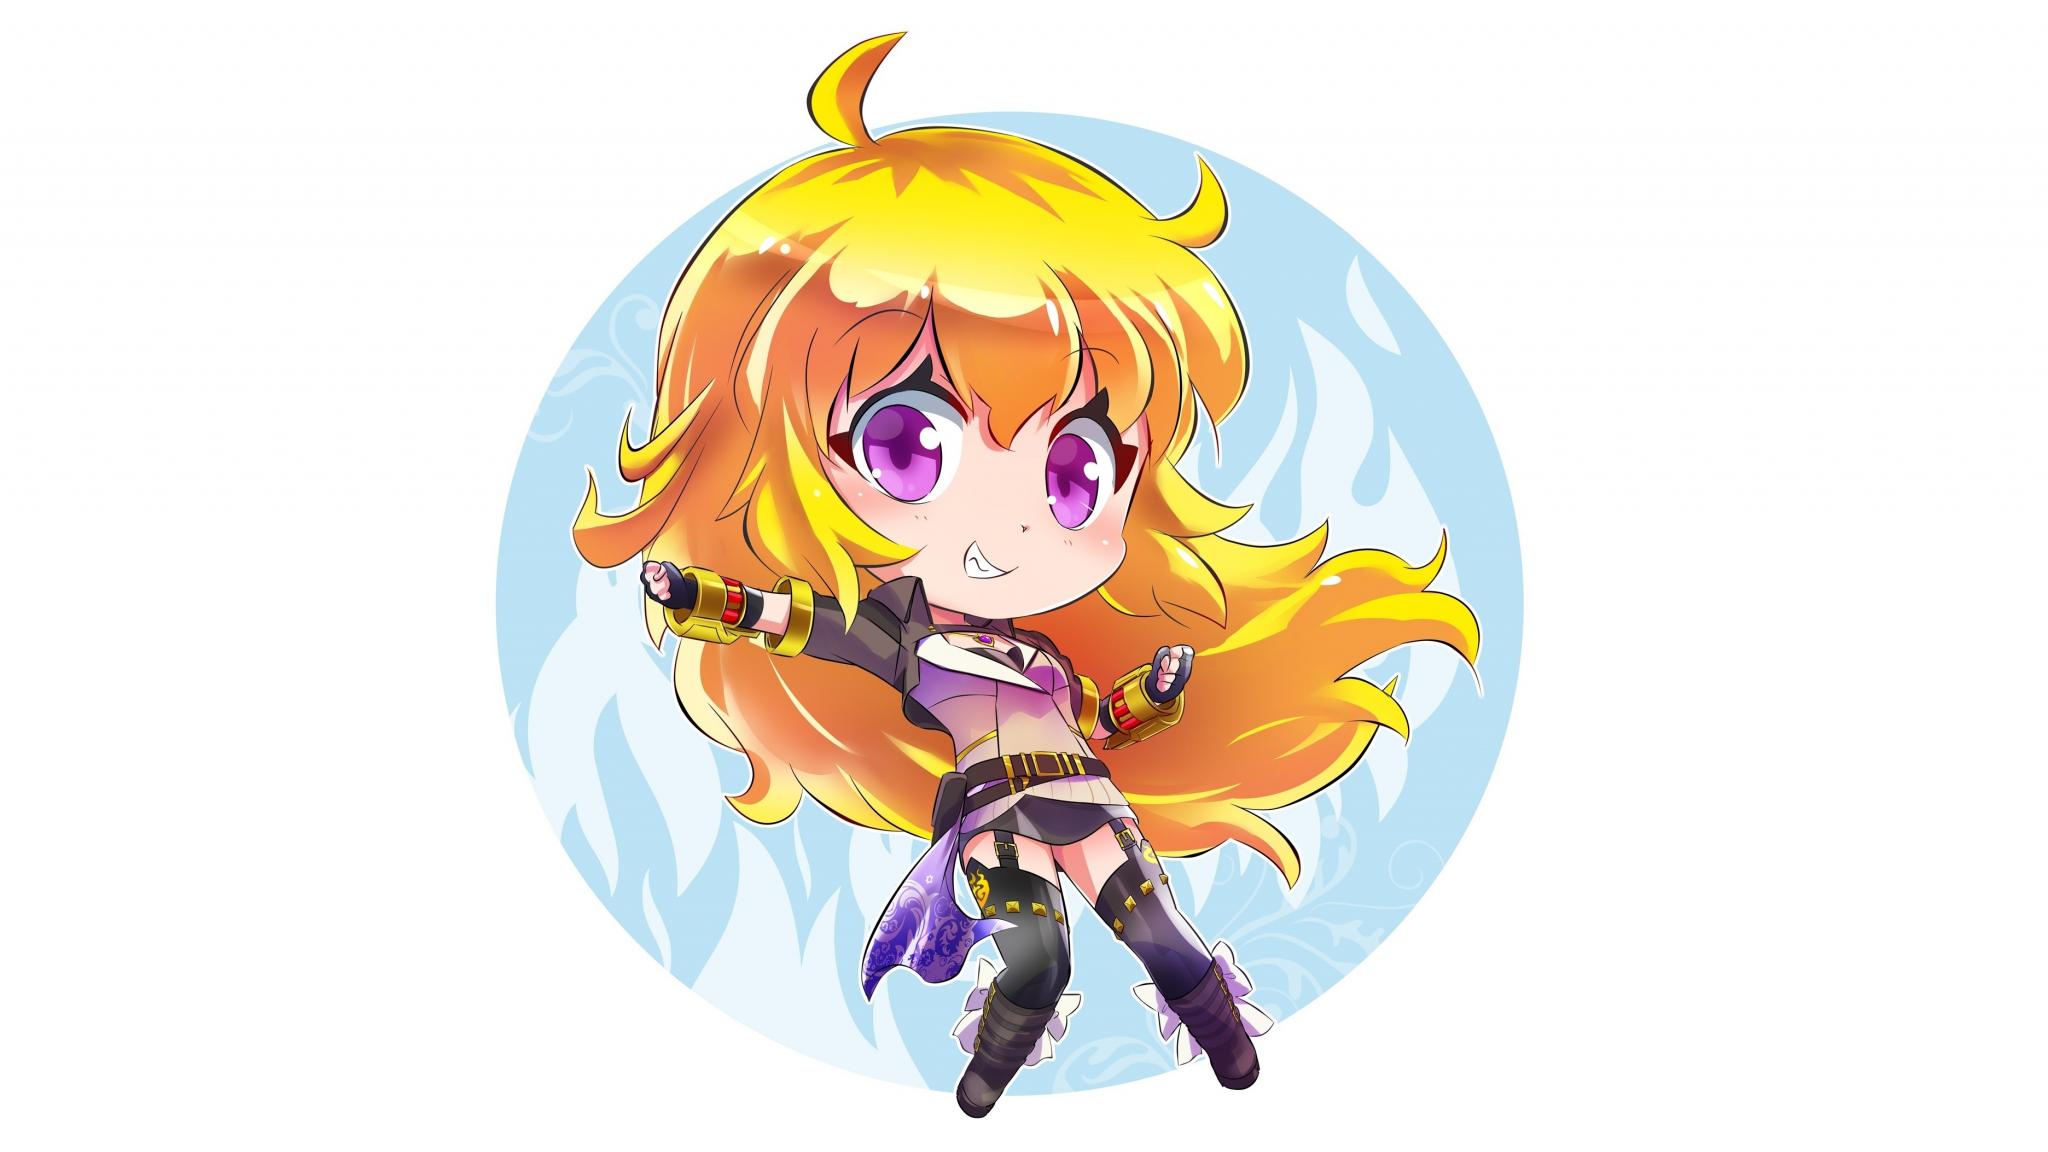 Download 2048x1152 Wallpaper Kid Version Anime Girl Yang Xiao